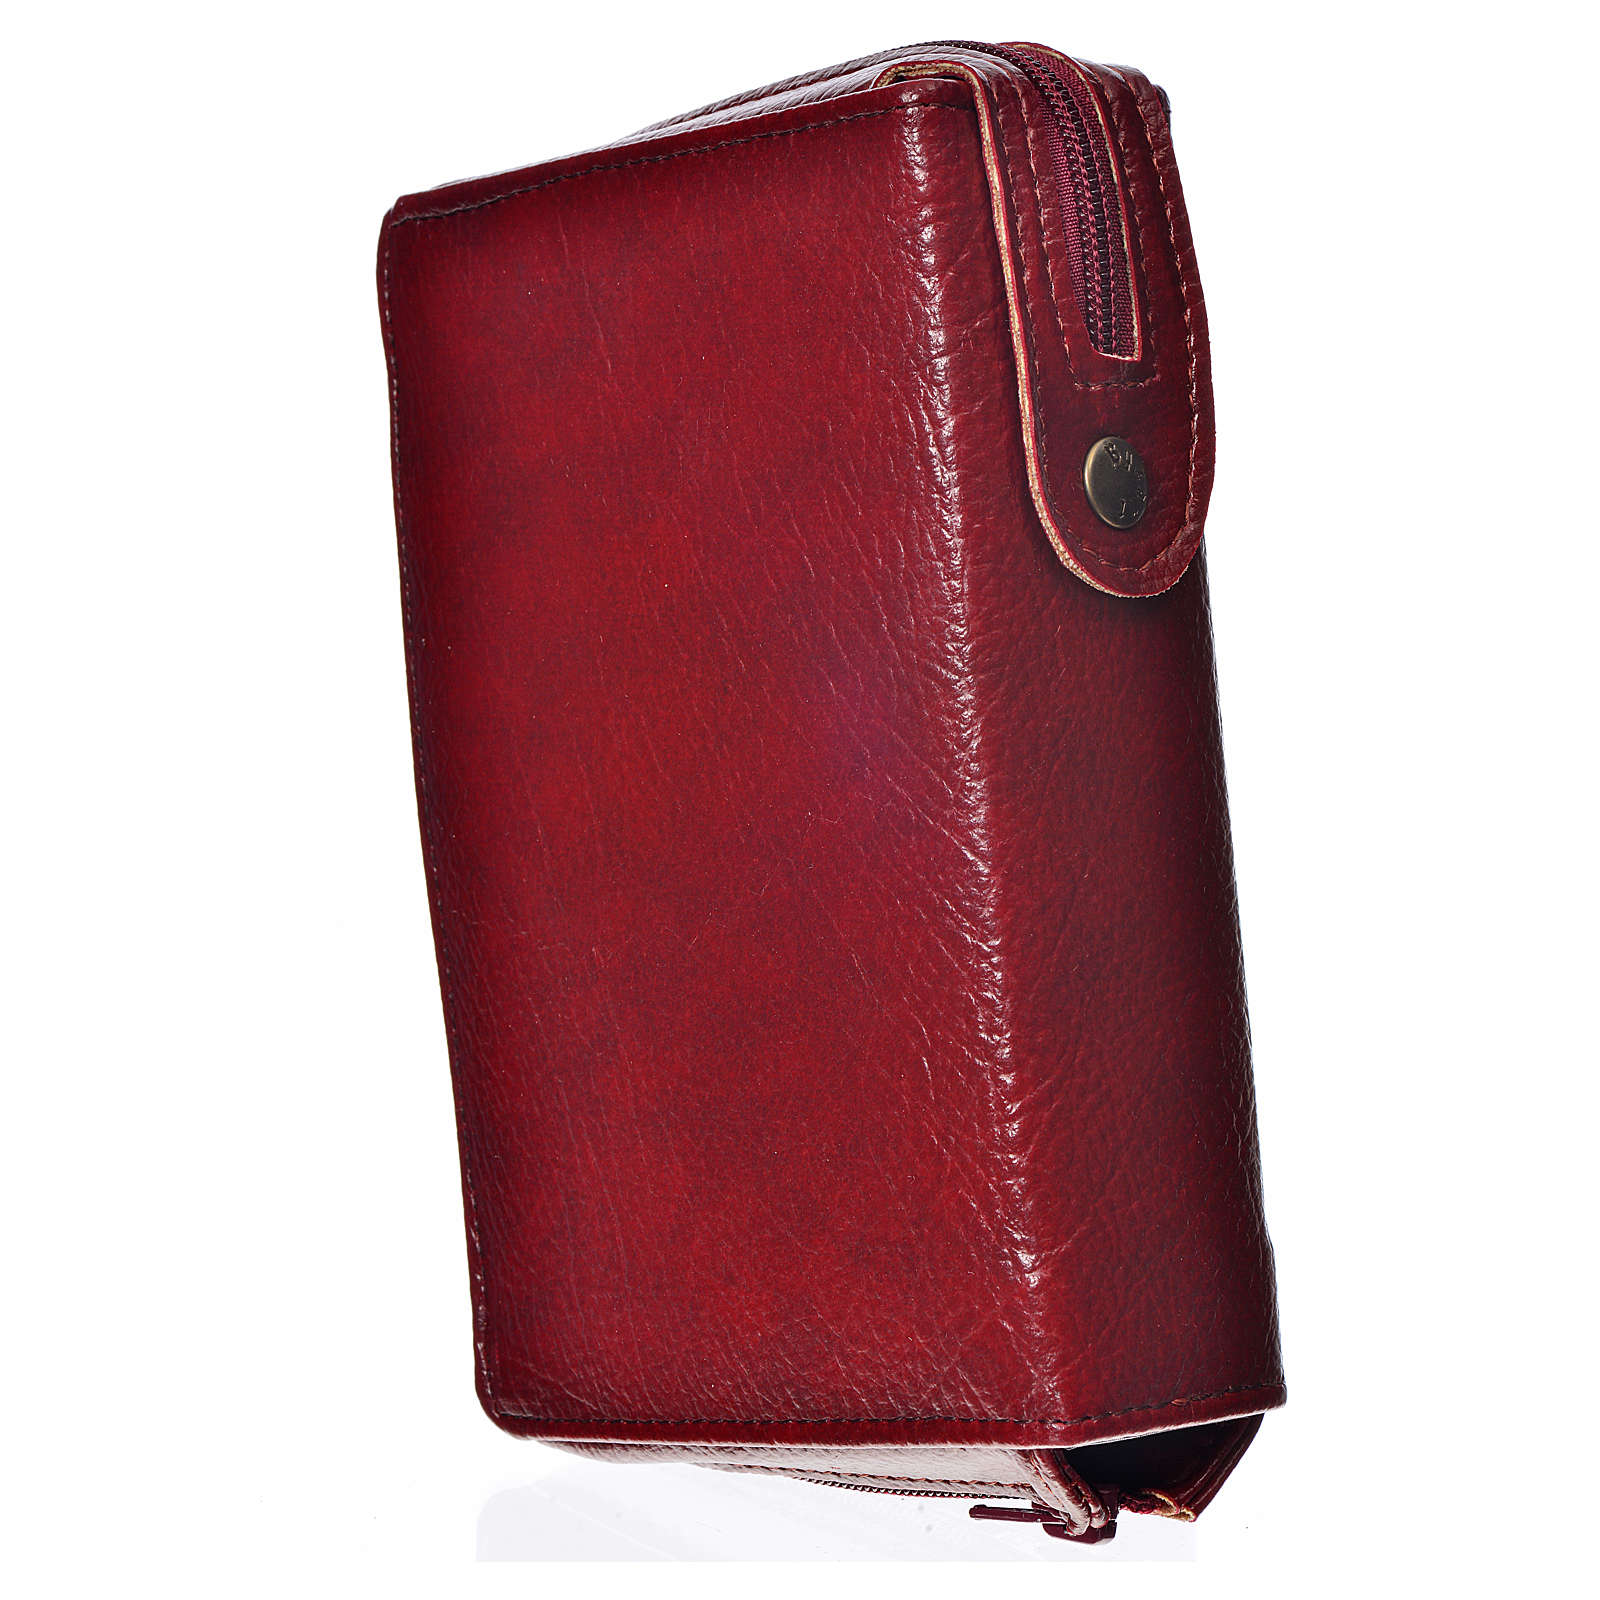 Funda Sagrada Biblia CEE ED. Pop. burdeos simil cuero Divina Mis 4